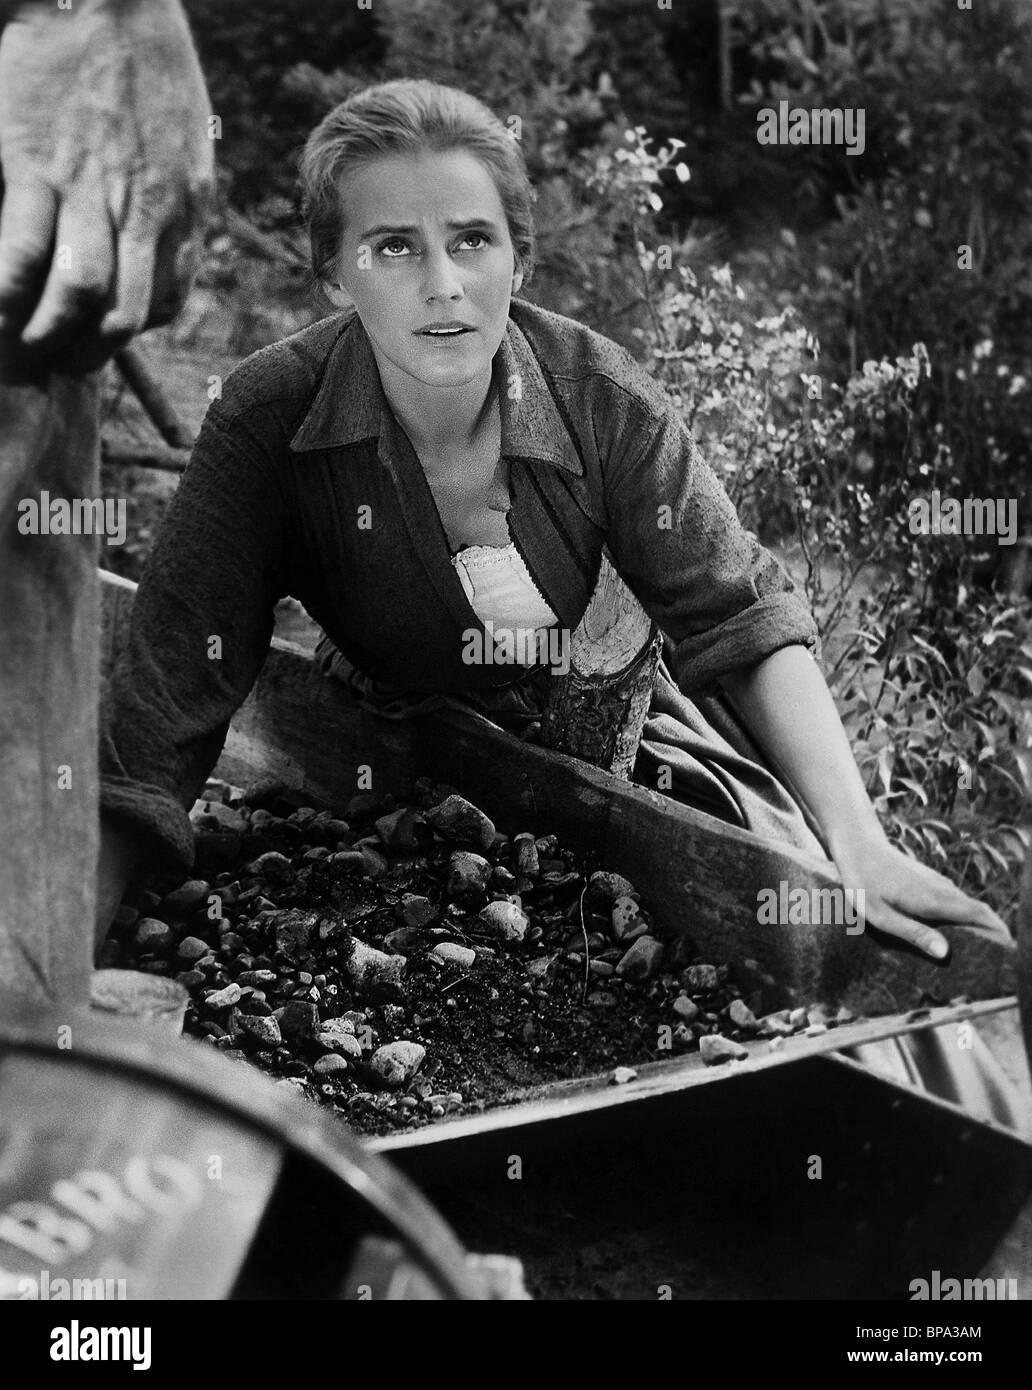 MARIA SCHELL THE BROTHERS KARAMAZOV (1958) - Stock Image